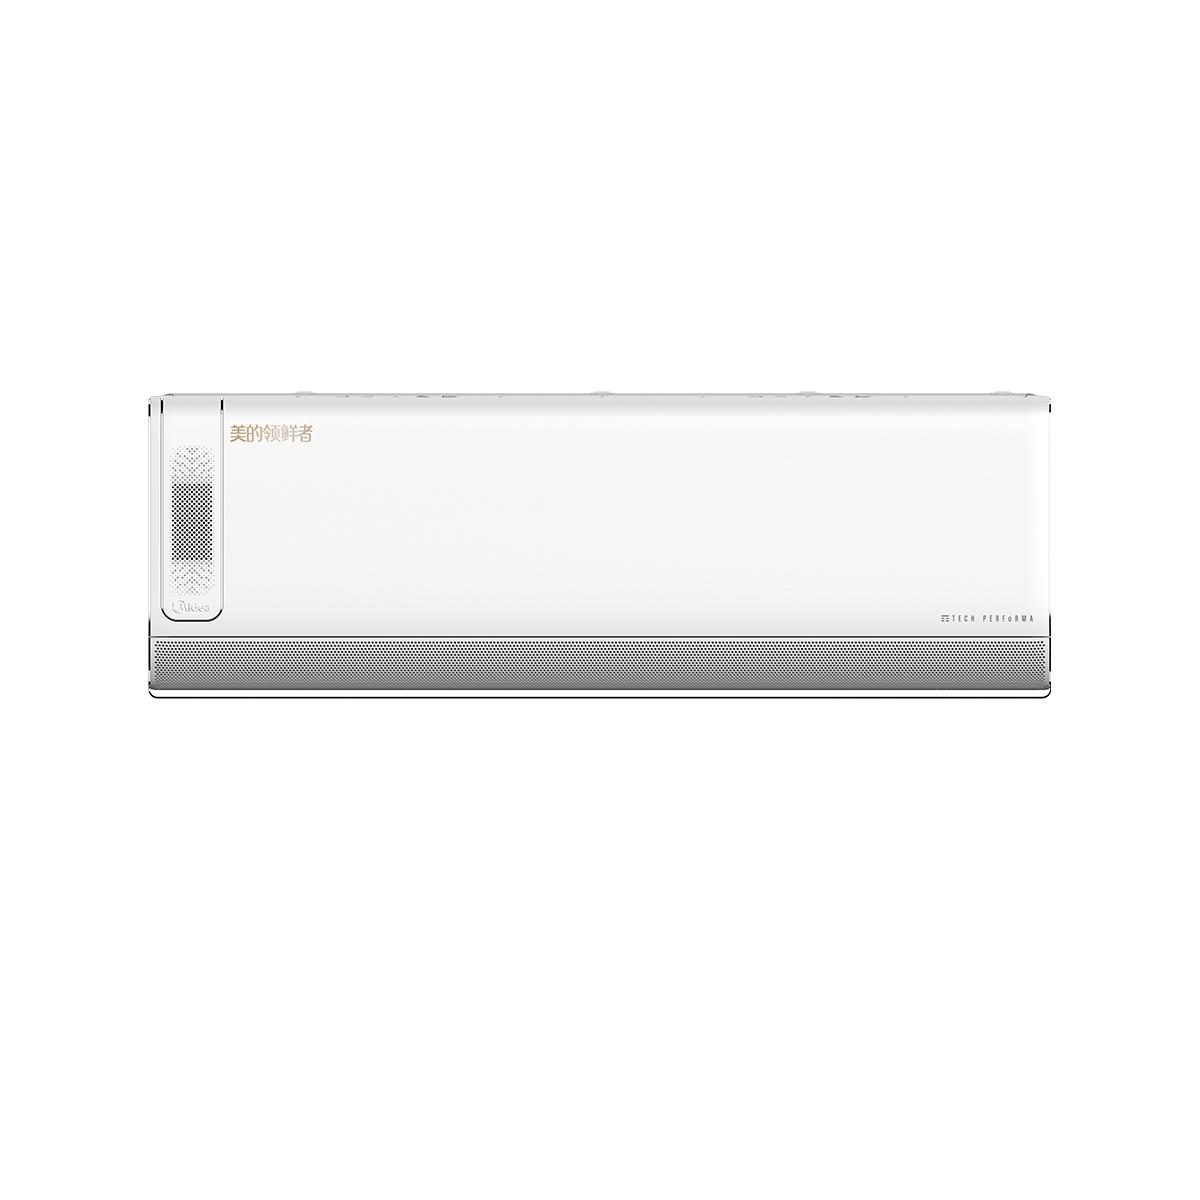 Midea/美的 KFR-26GW/BP3DN8Y-KW200(B1)家用空调套机 说明书.pdf